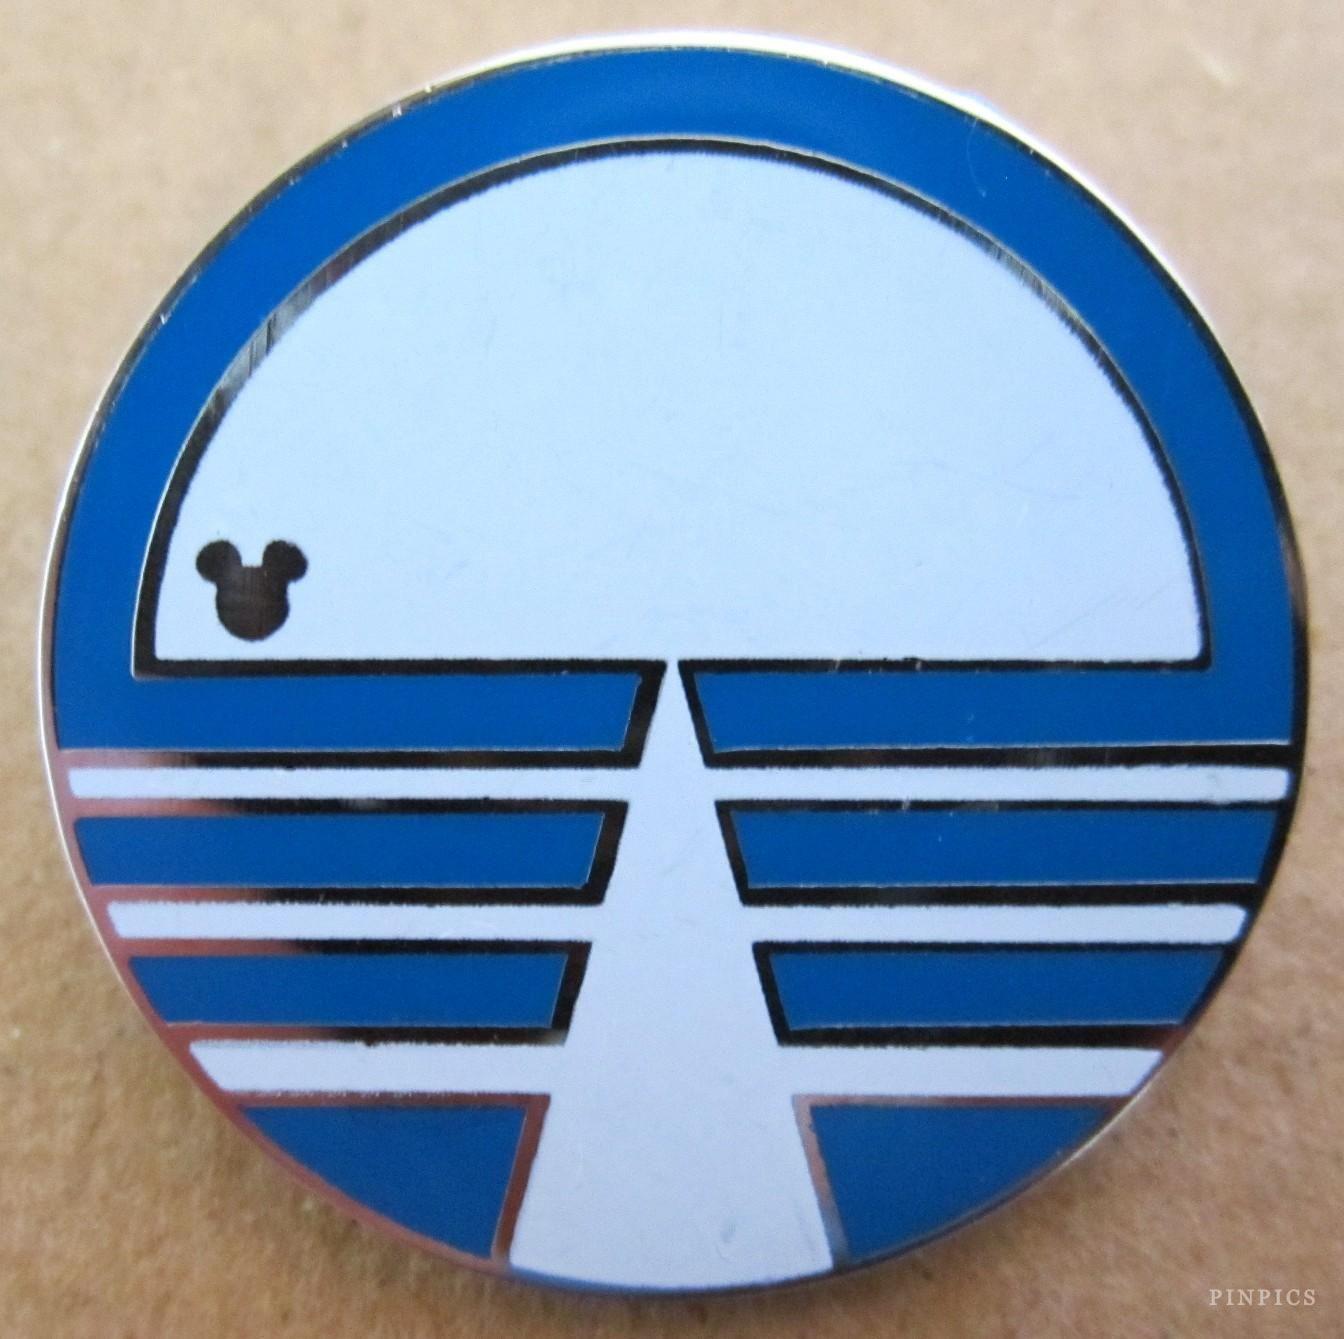 WDW - 2015 Hidden Mickey Series - EPCOT Center Logos - Horizons - Pin 108459